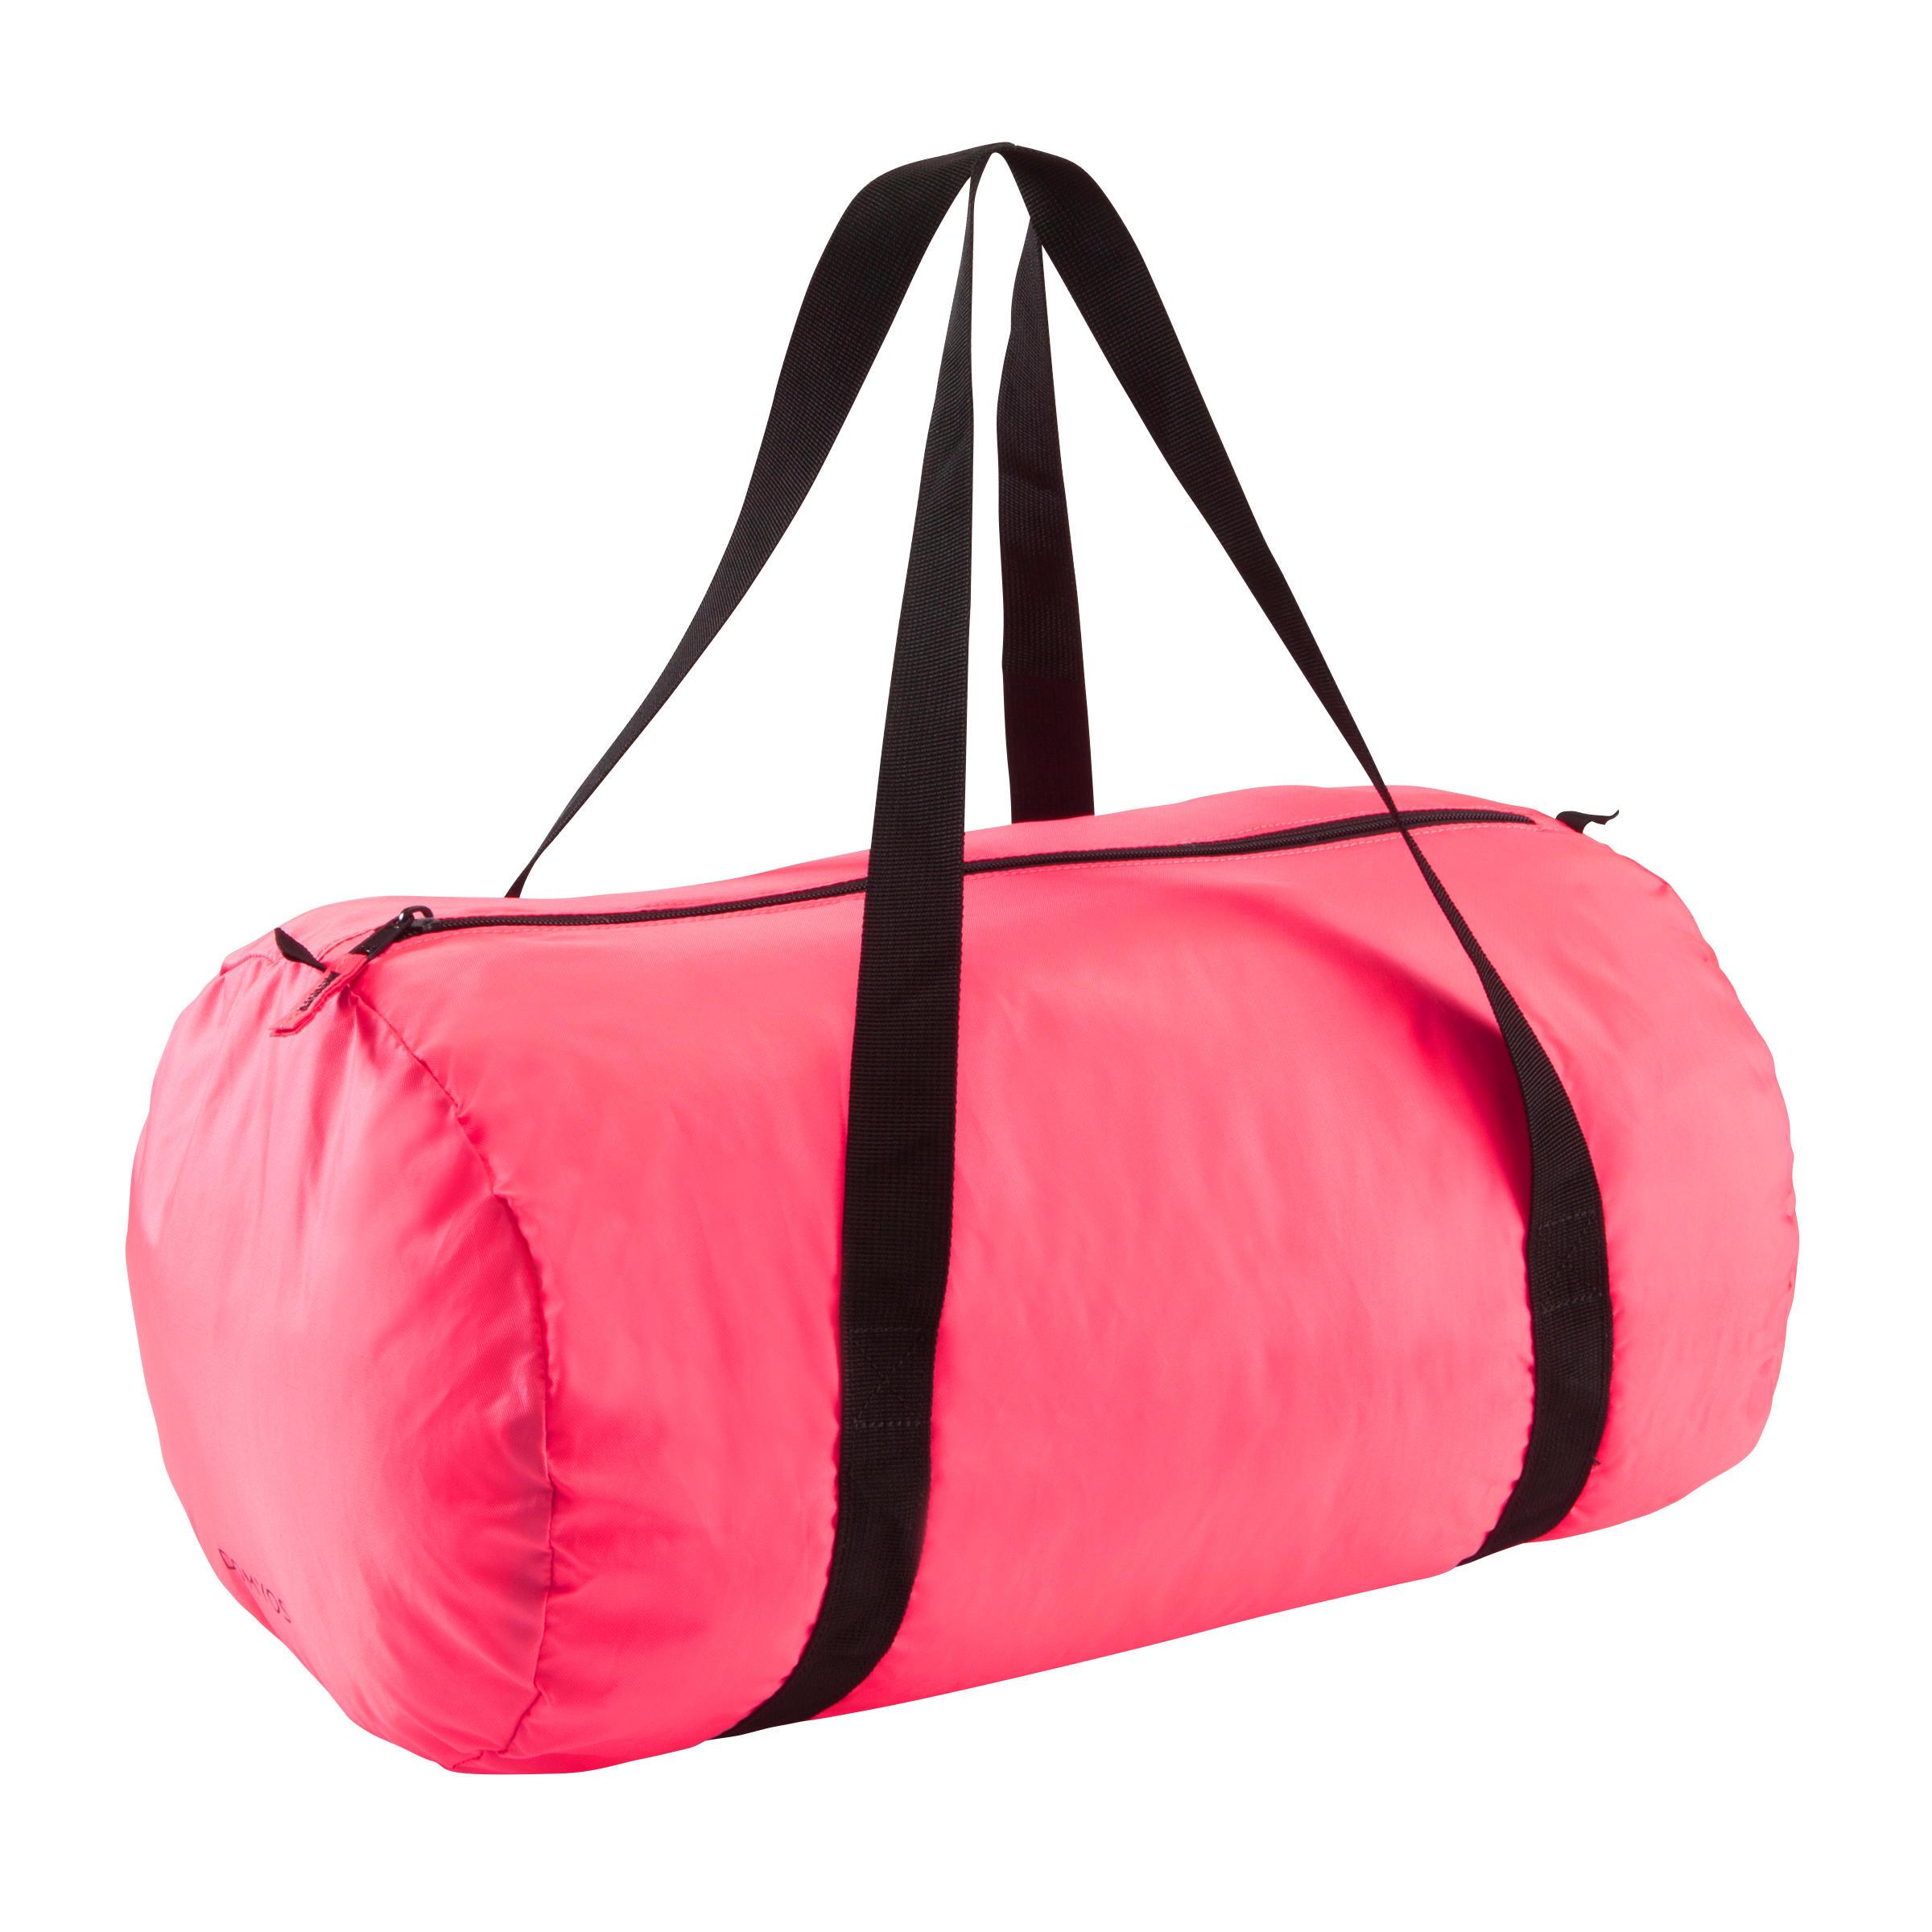 Geantă fitness 30 L roz